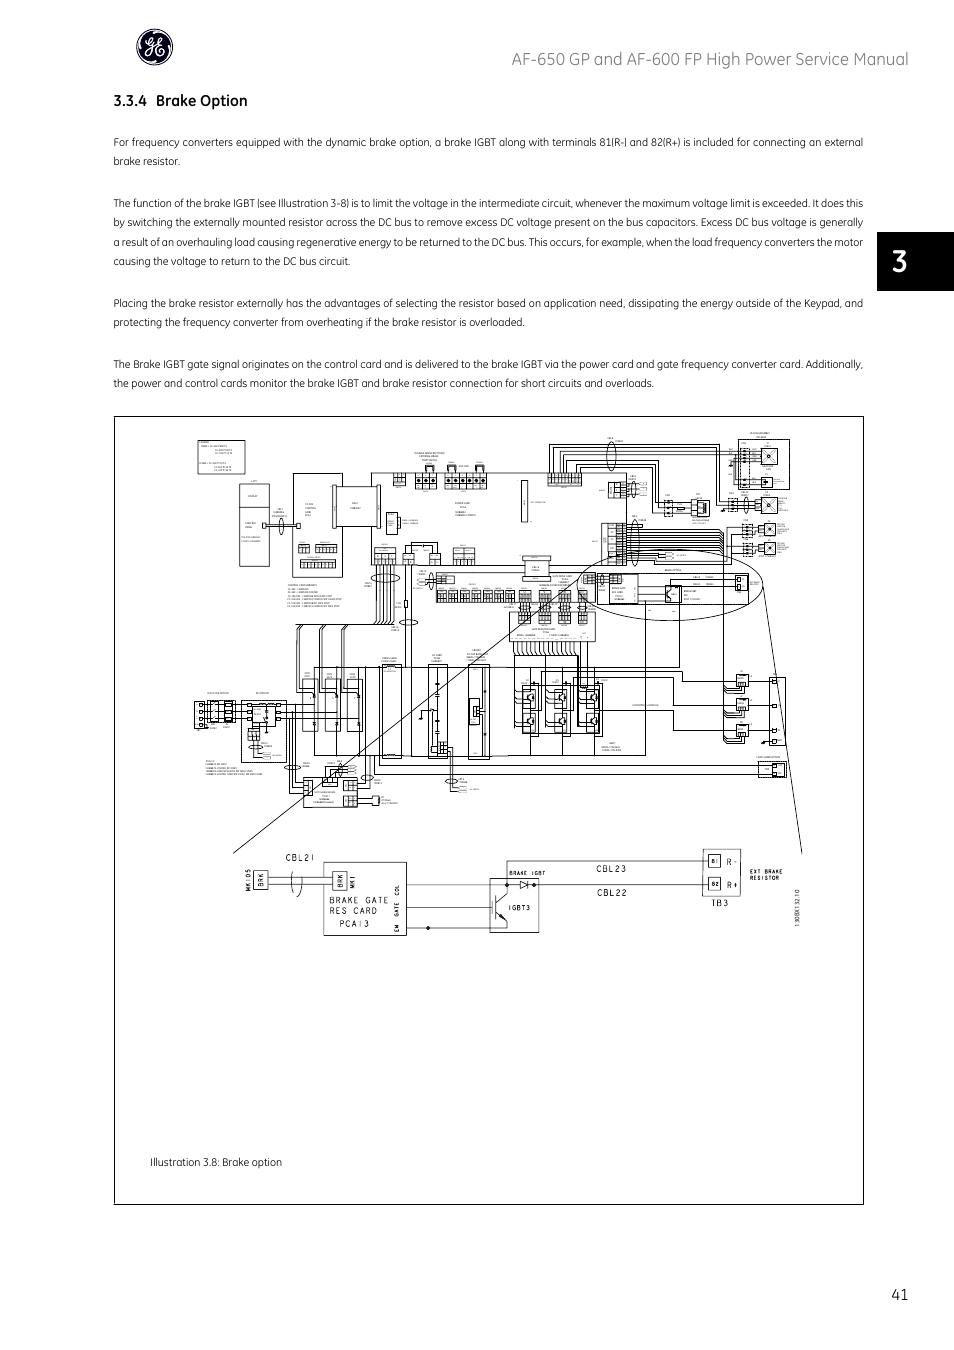 Ge Scr Manual Alarm Circuit Signalprocessing Diagram Seekiccom Array 4 Brake Option S L2 T L3 M Sensors Current Industrial Rh Manualsdir